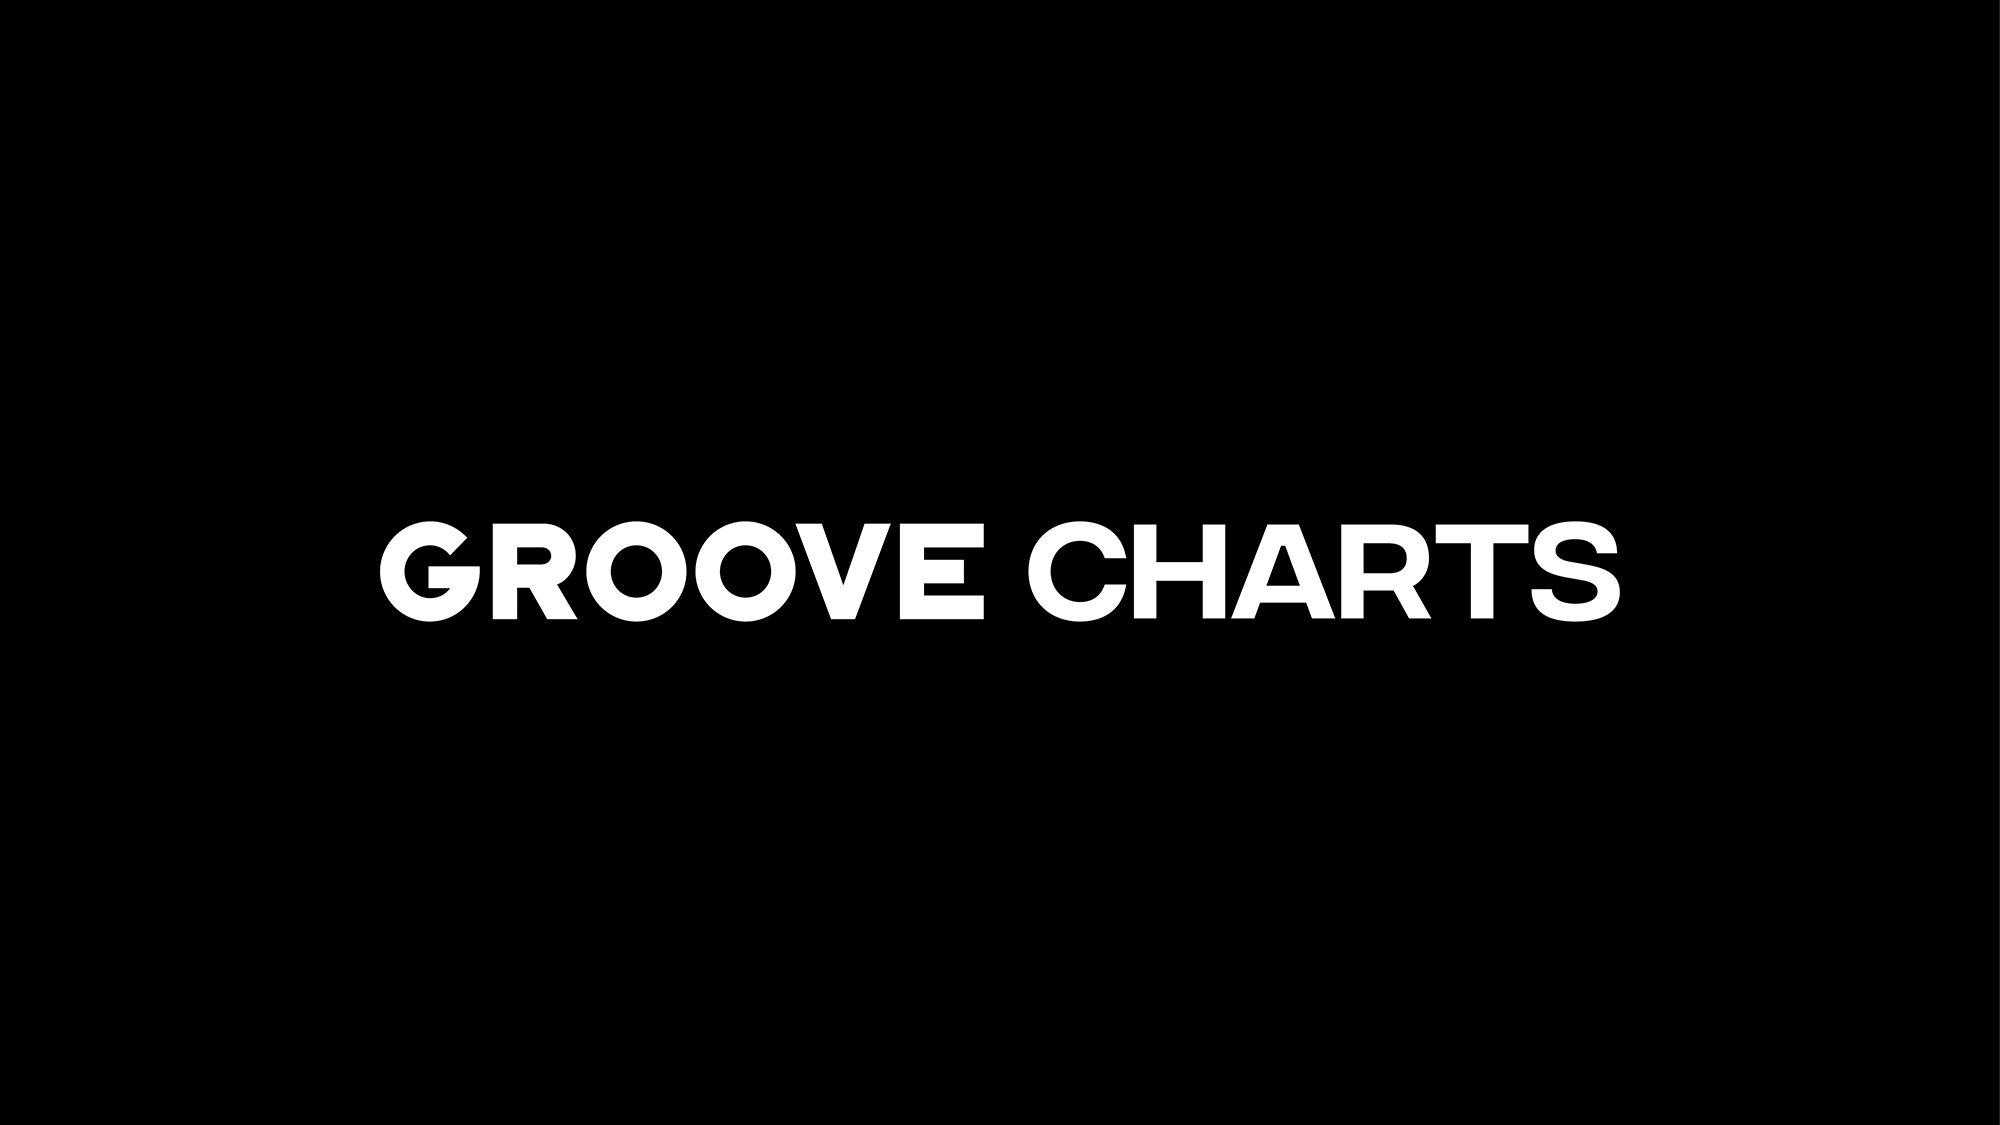 Groove DJ-Charts mit DJ Plead, Etapp Kyle, Lola Haro und Muting The Noise